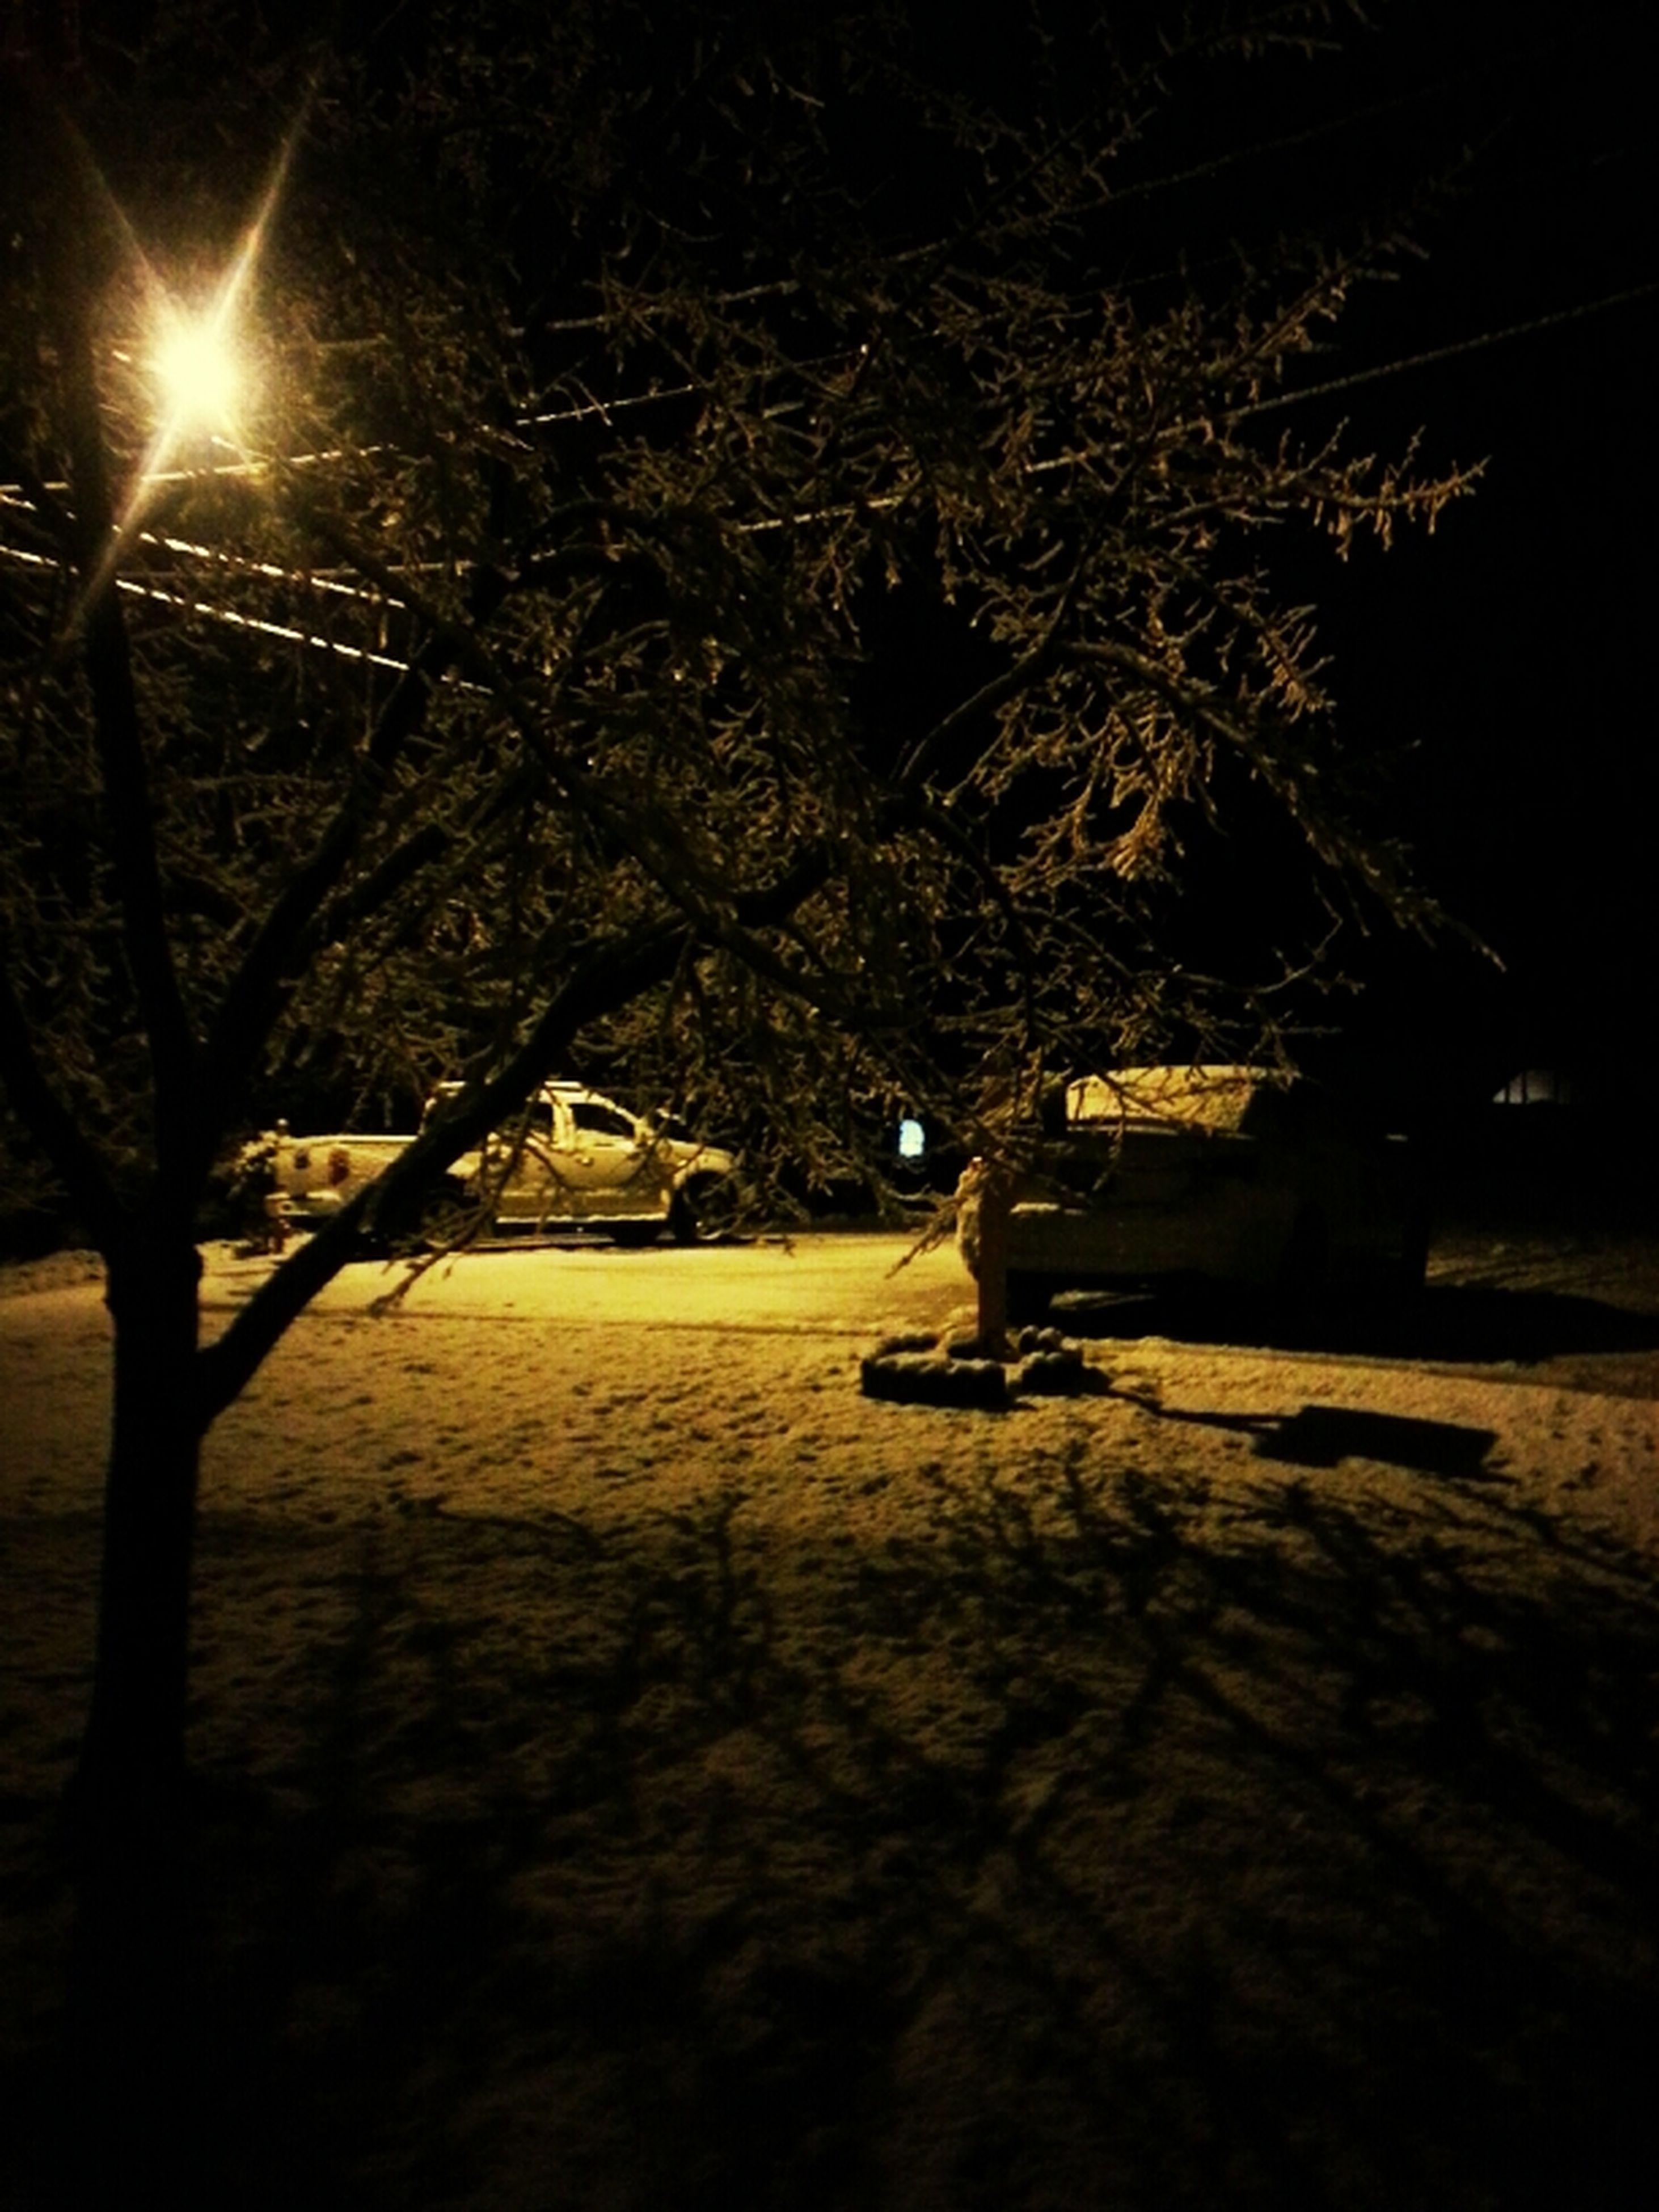 night, bare tree, tree, silhouette, sun, branch, snow, illuminated, winter, tranquility, sunlight, dark, street light, nature, lens flare, cold temperature, tranquil scene, sky, outdoors, sunbeam